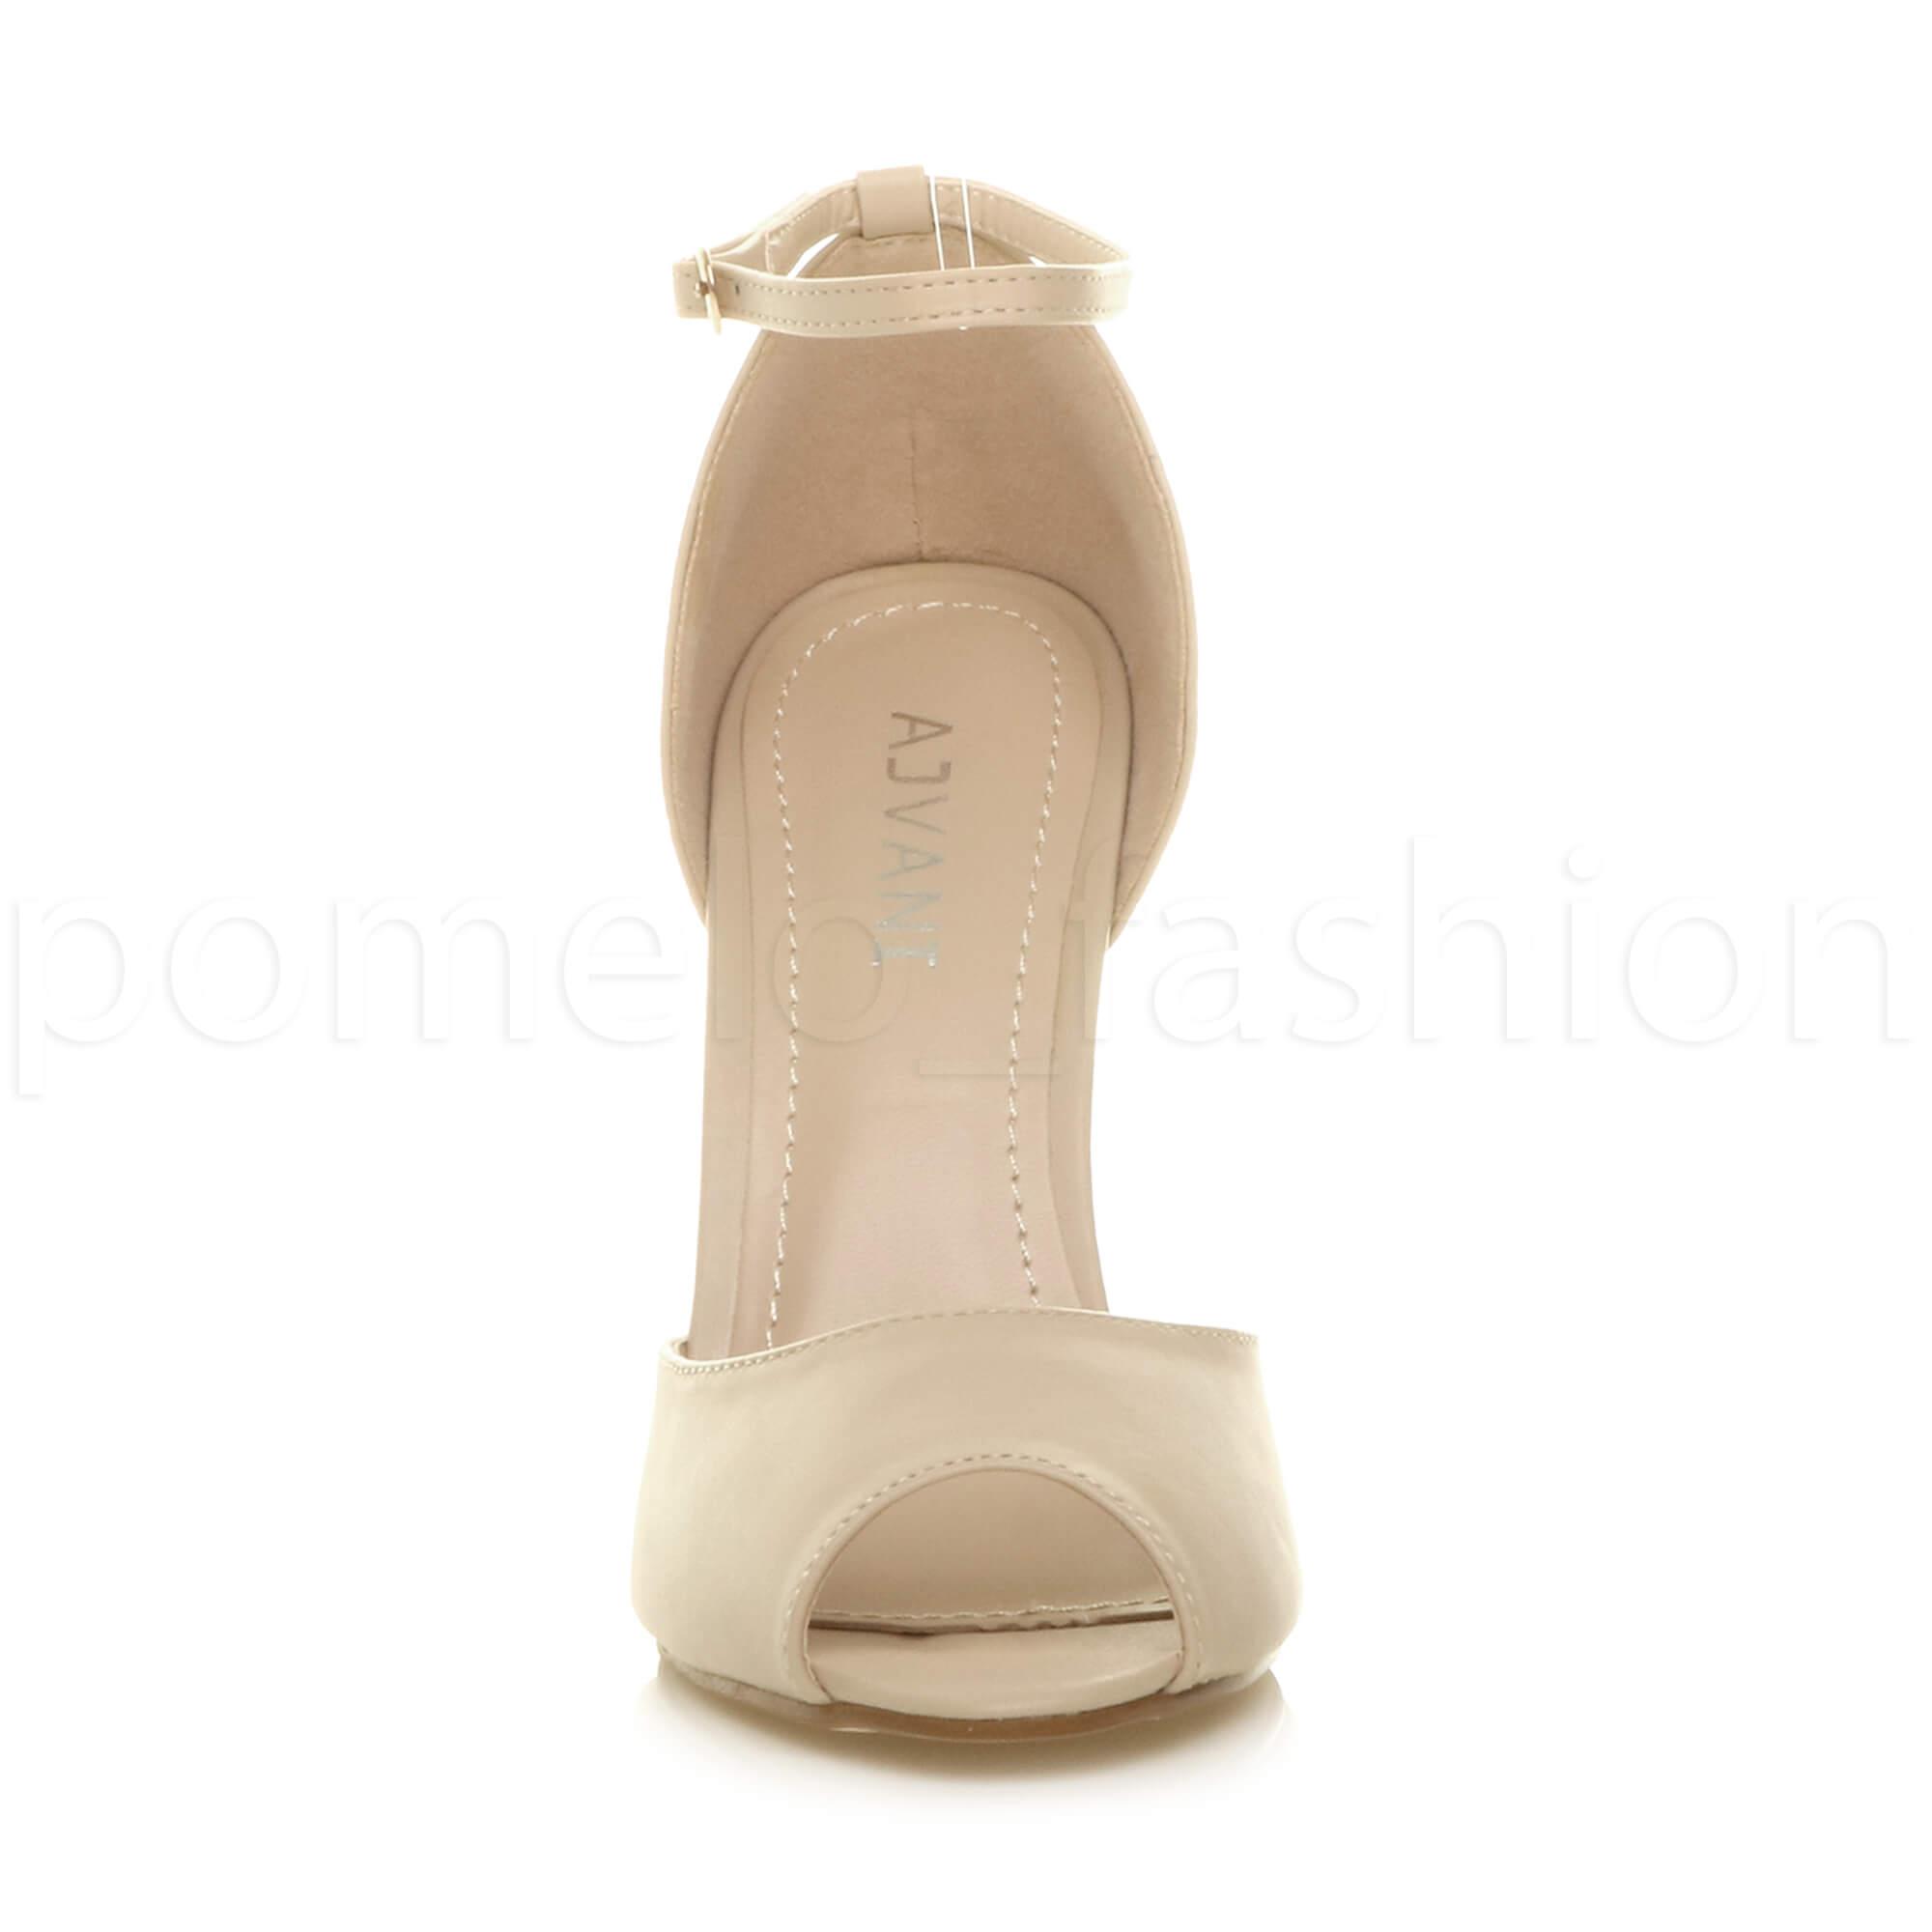 WOMENS-LADIES-HIGH-HEEL-WEDDING-BRIDESMAID-EVENING-STILETTOS-PEEP-TOE-SHOES-SIZE thumbnail 48